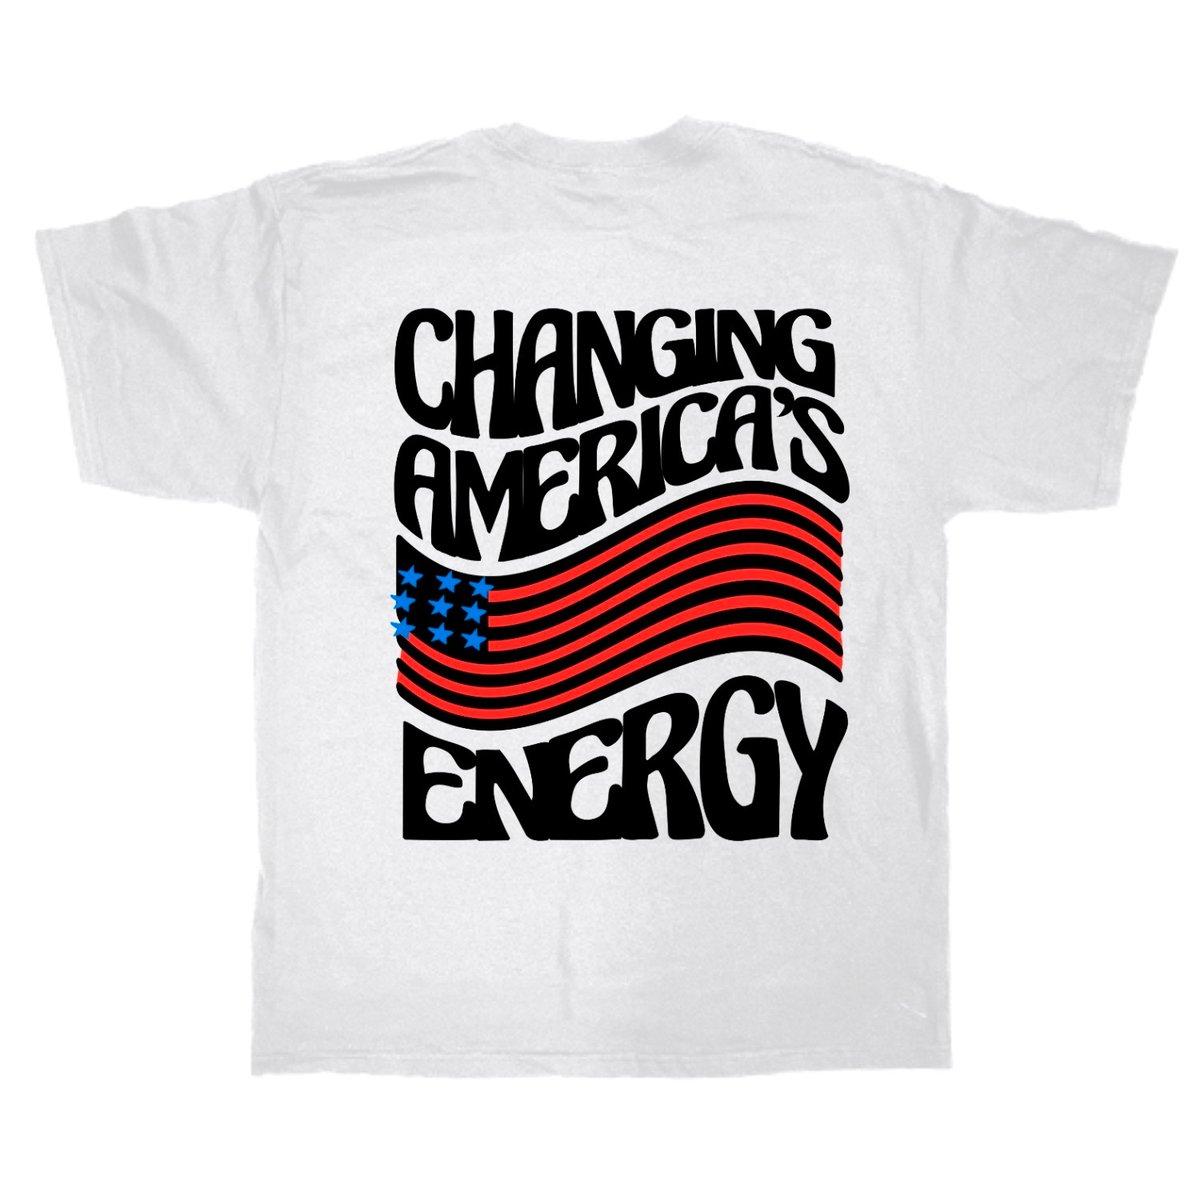 CHANGE AMERICA's ENERGY